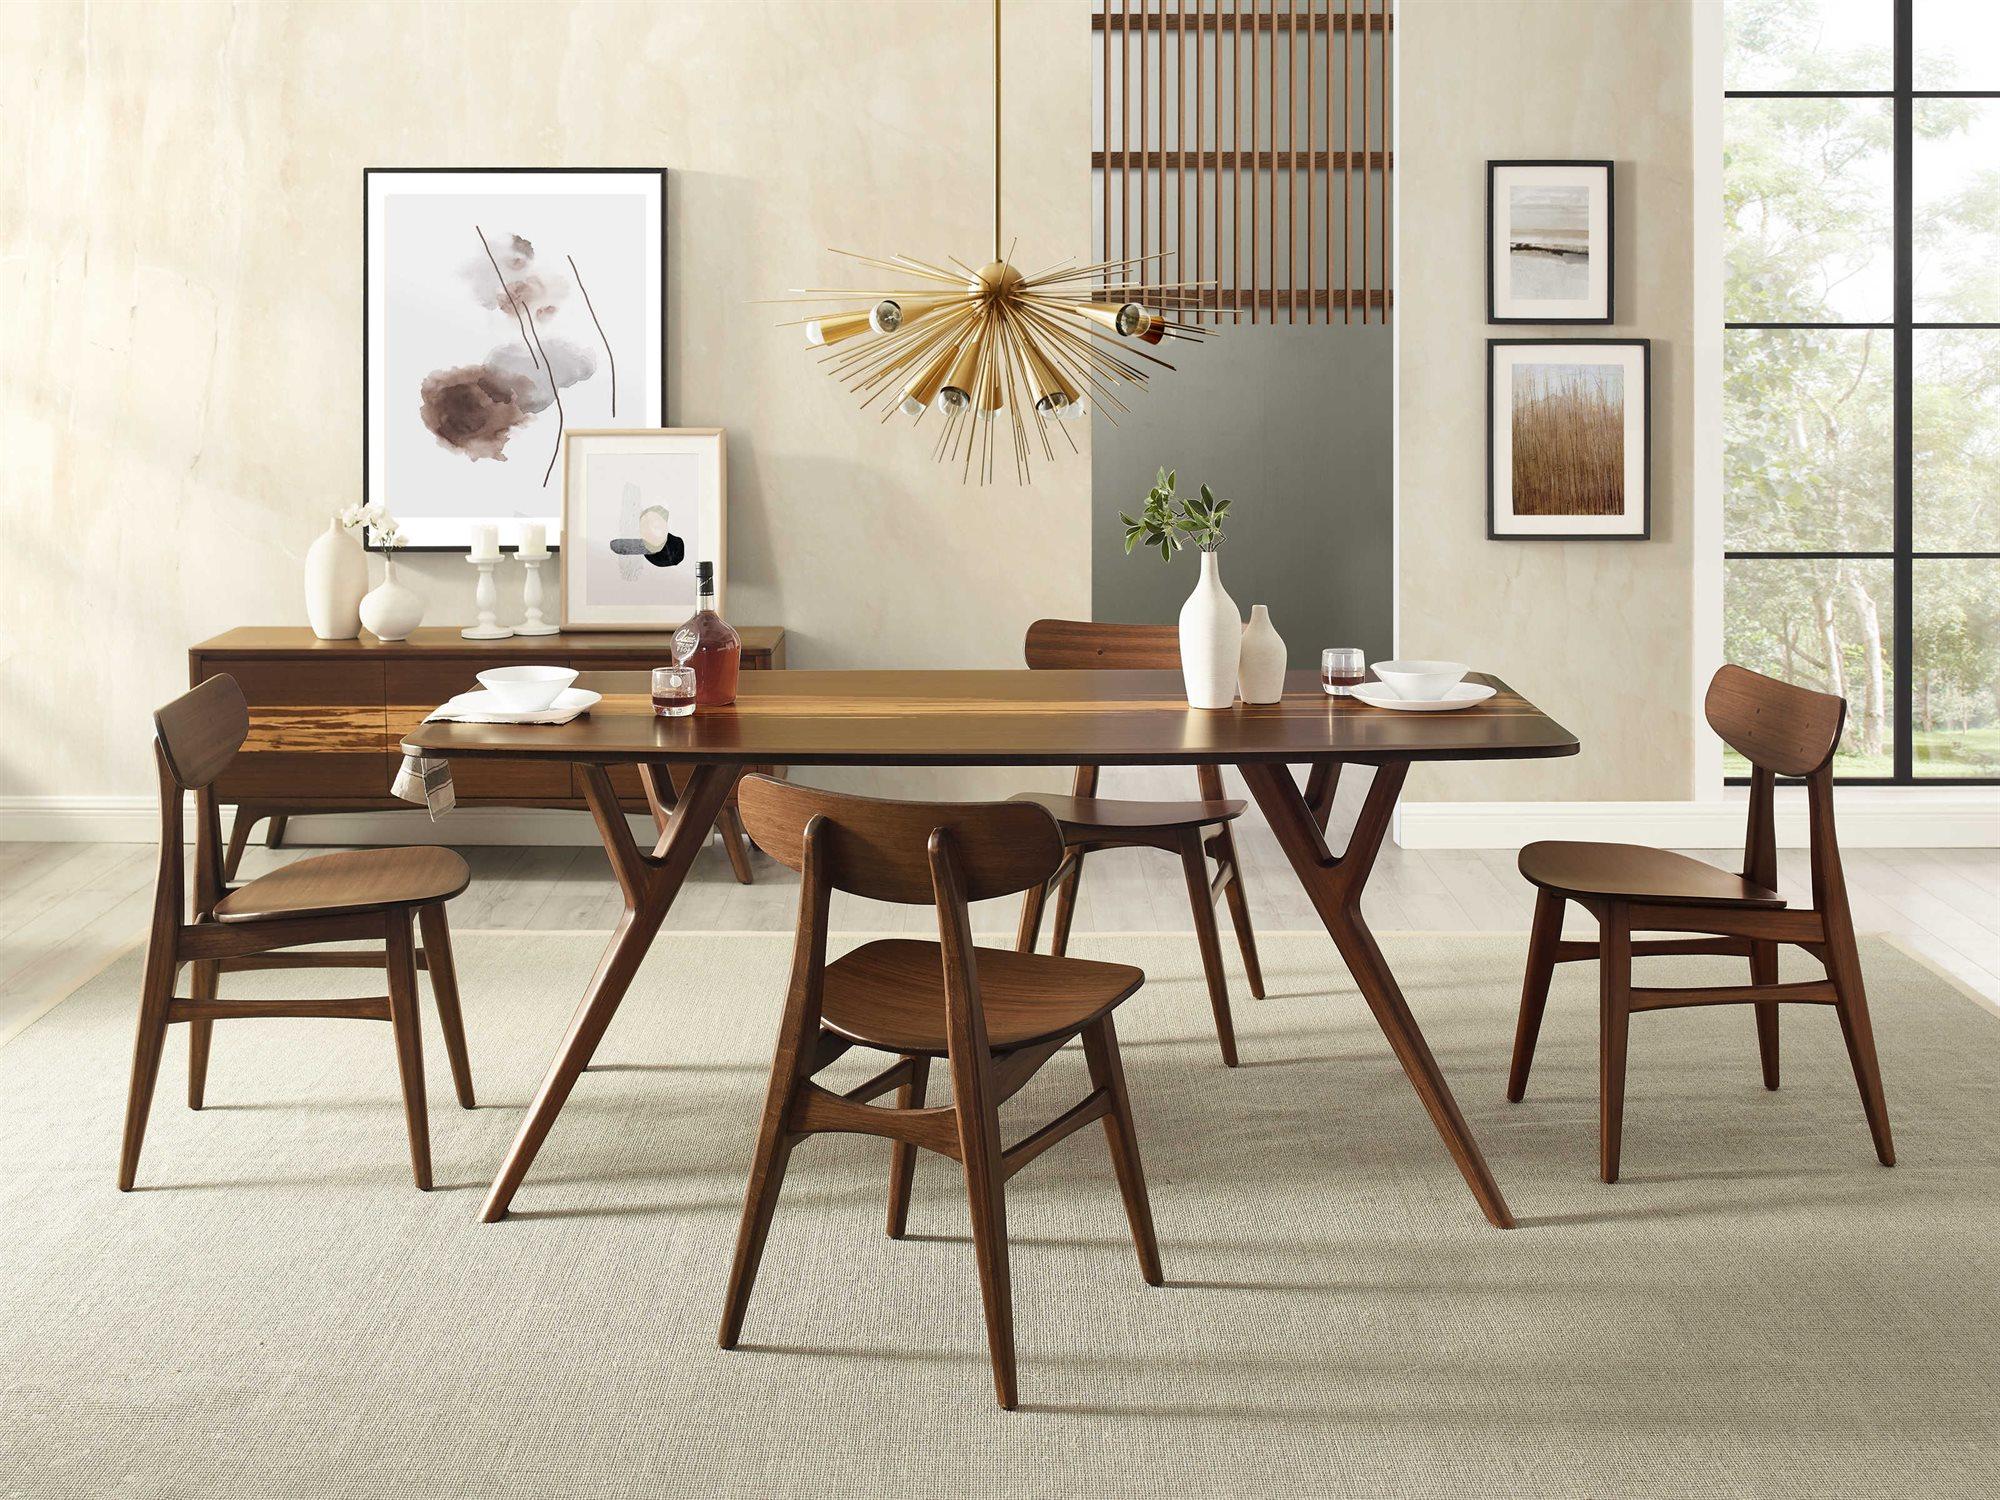 Heavy Duty Folding Picnic Table, Greenington Azara Modern Casual Dining Room Table Gtga0008saset